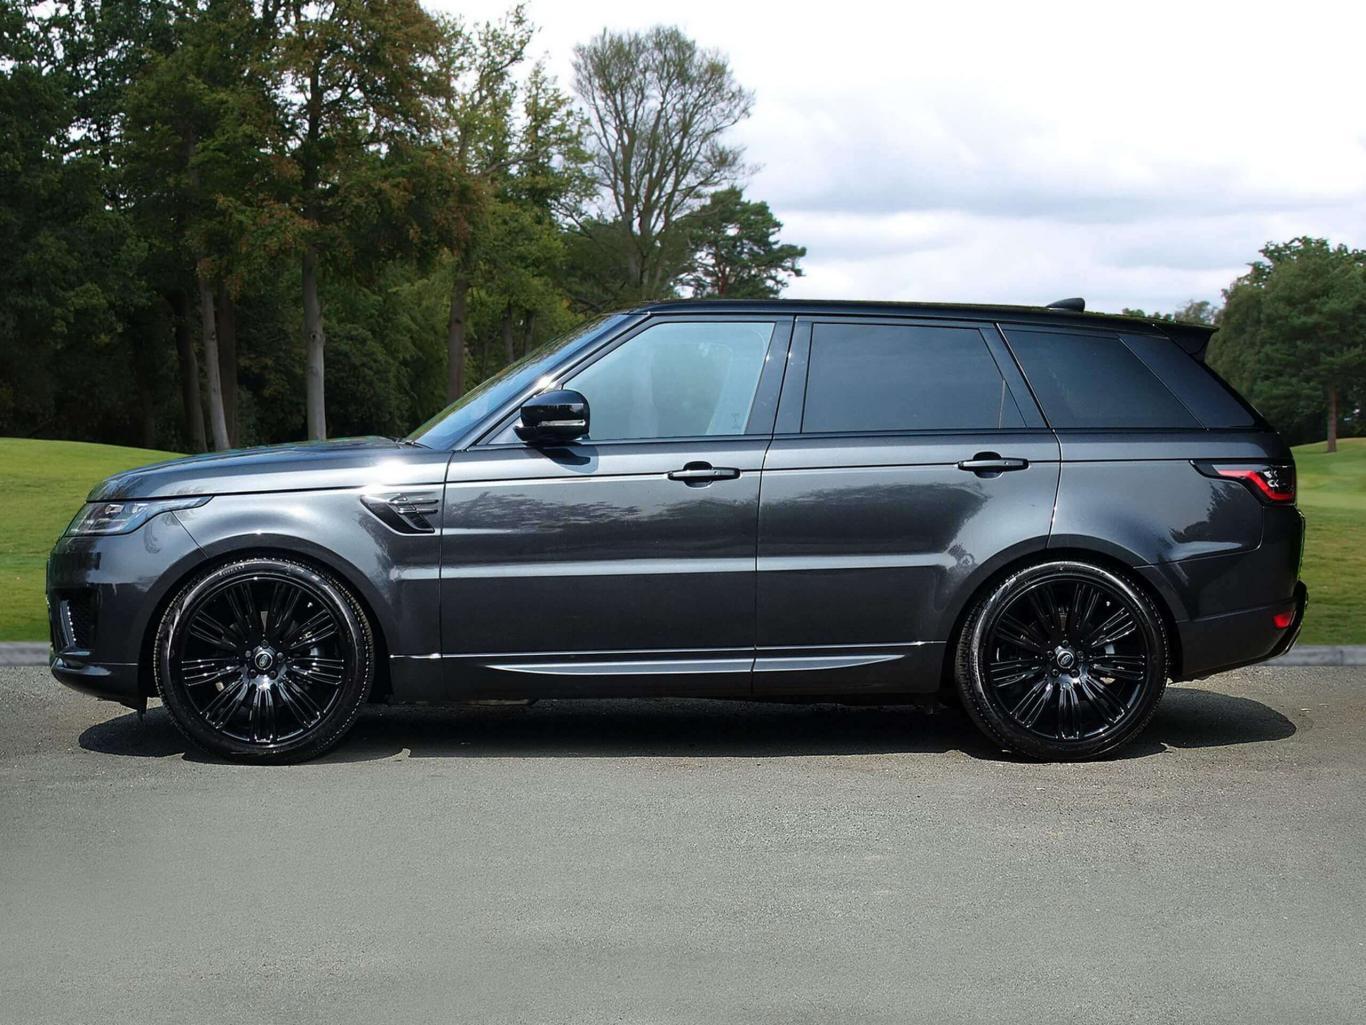 Land Rover Range Rover Sport 30 Sdv6 Hse Dynamic Eu6 2018 4x4 Carpathian Grey Metallic With Contras